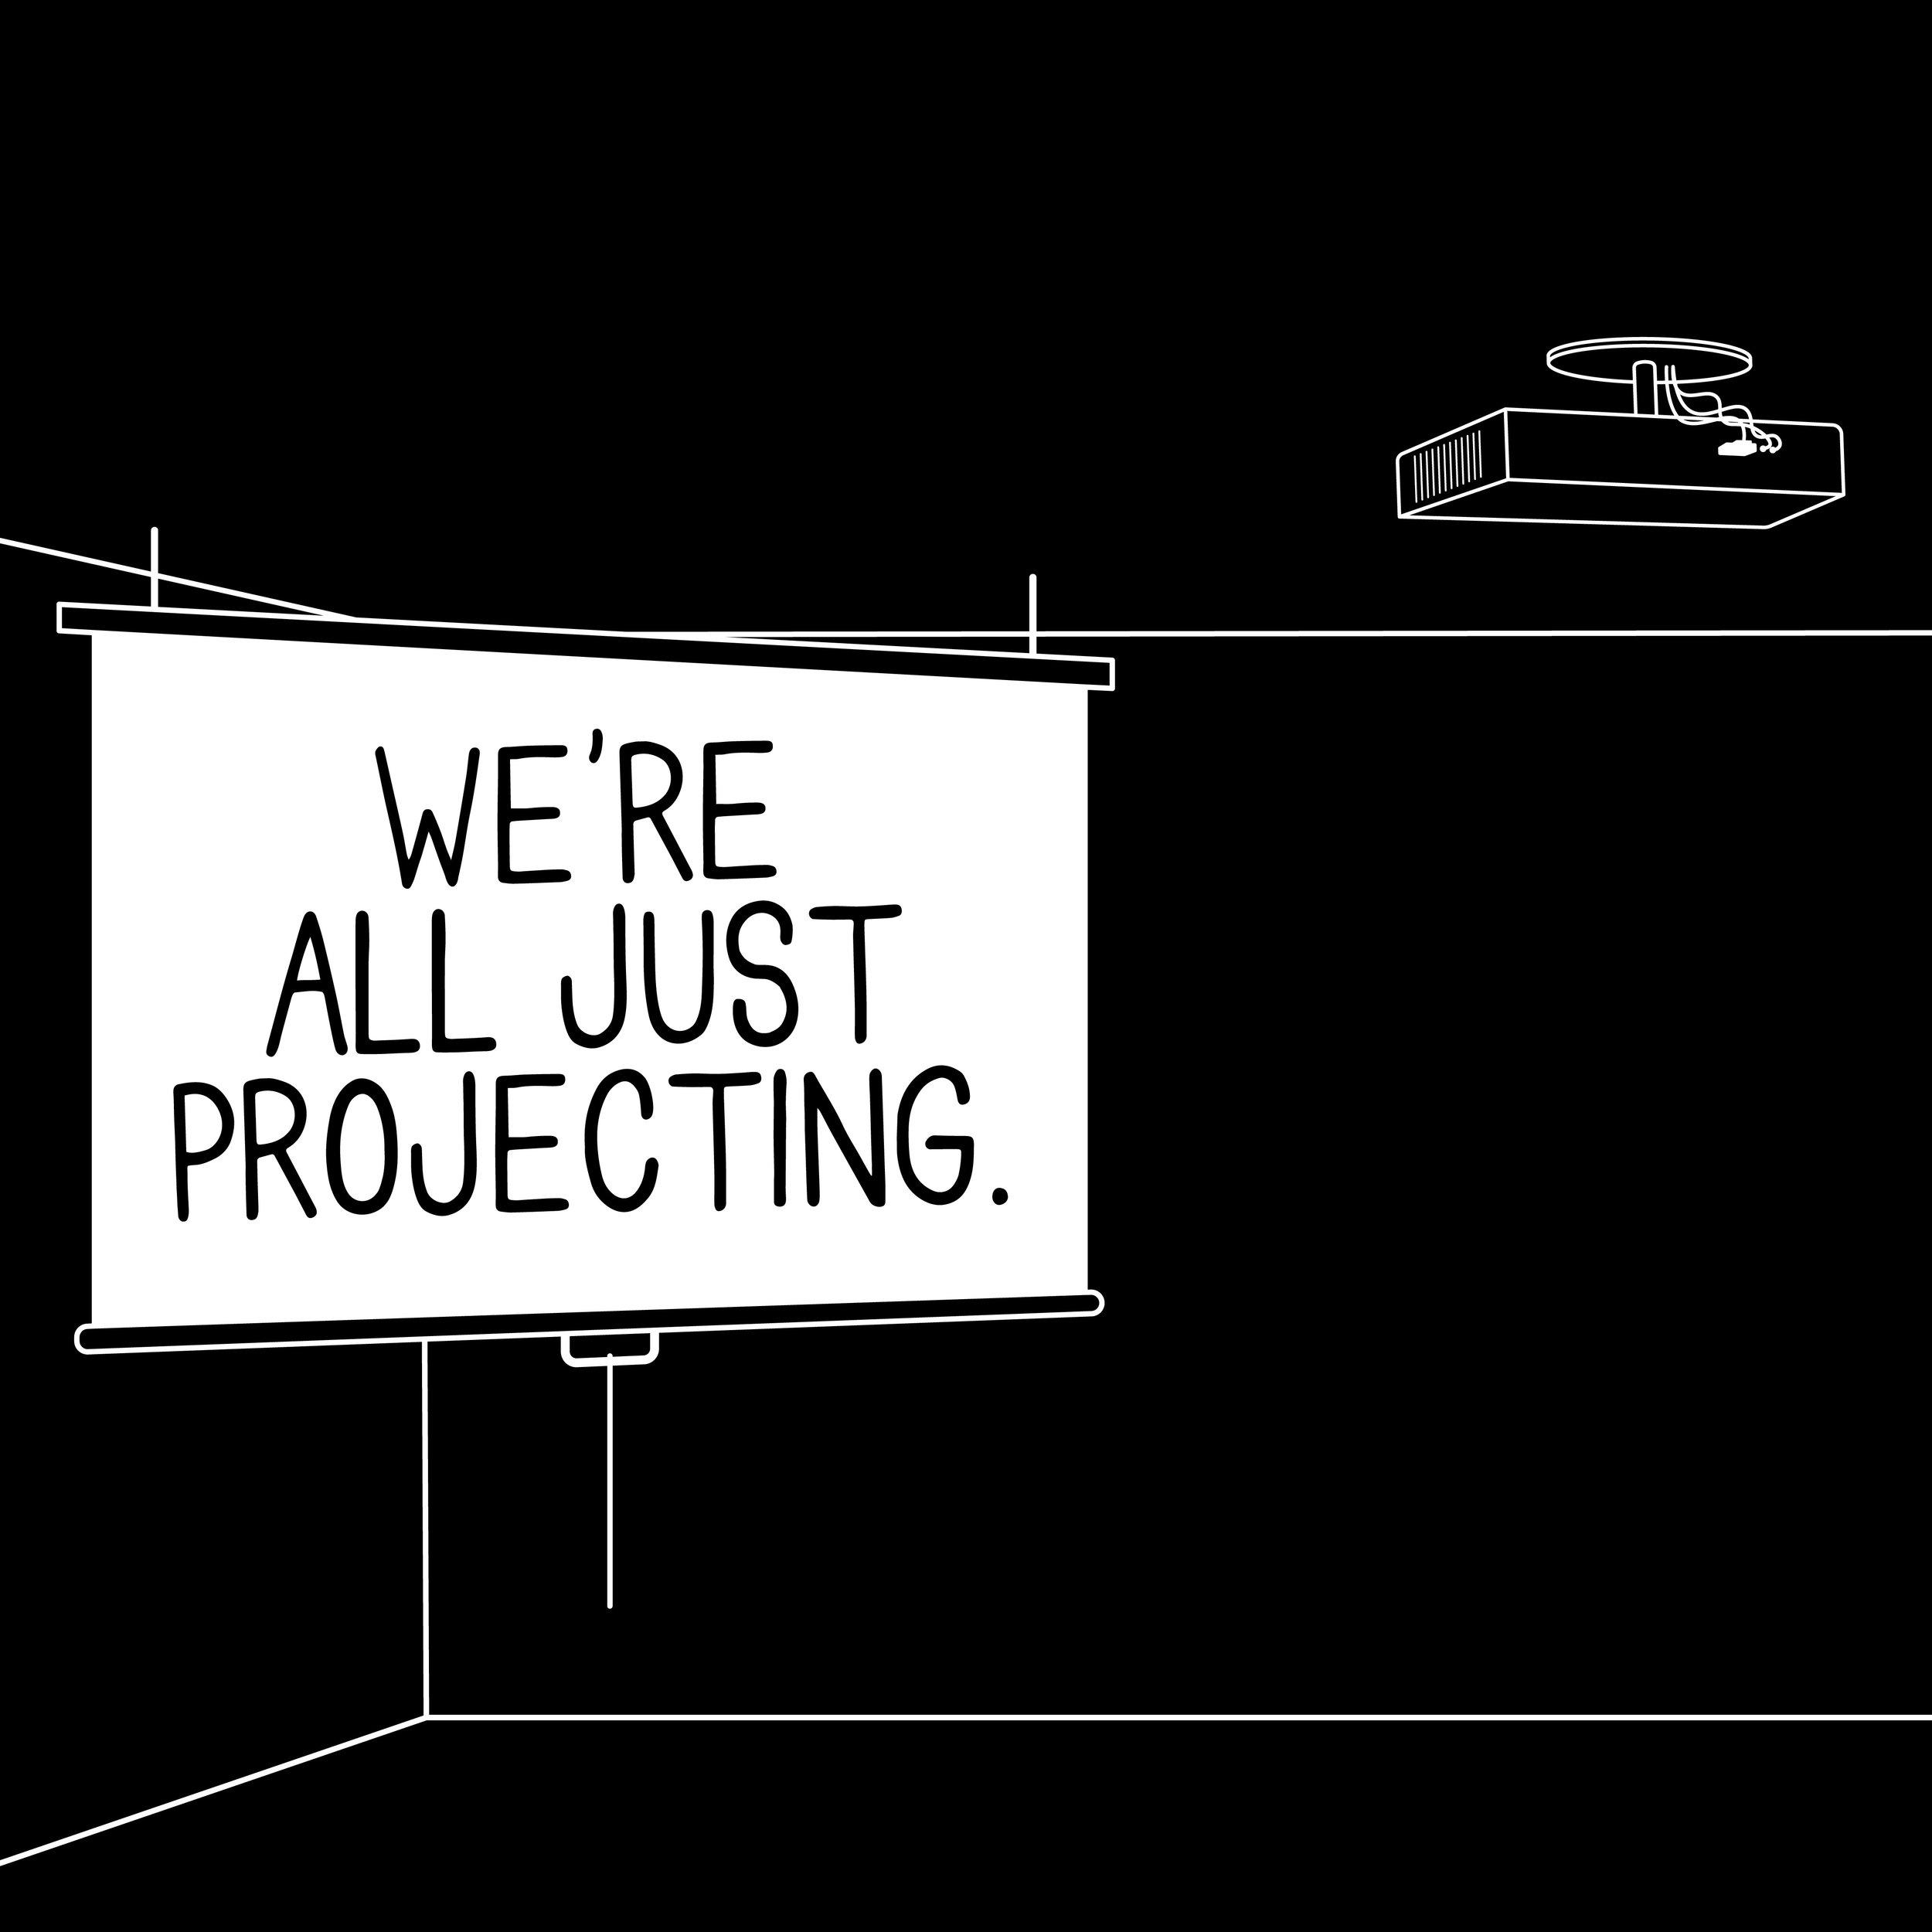 projecting-01.jpg